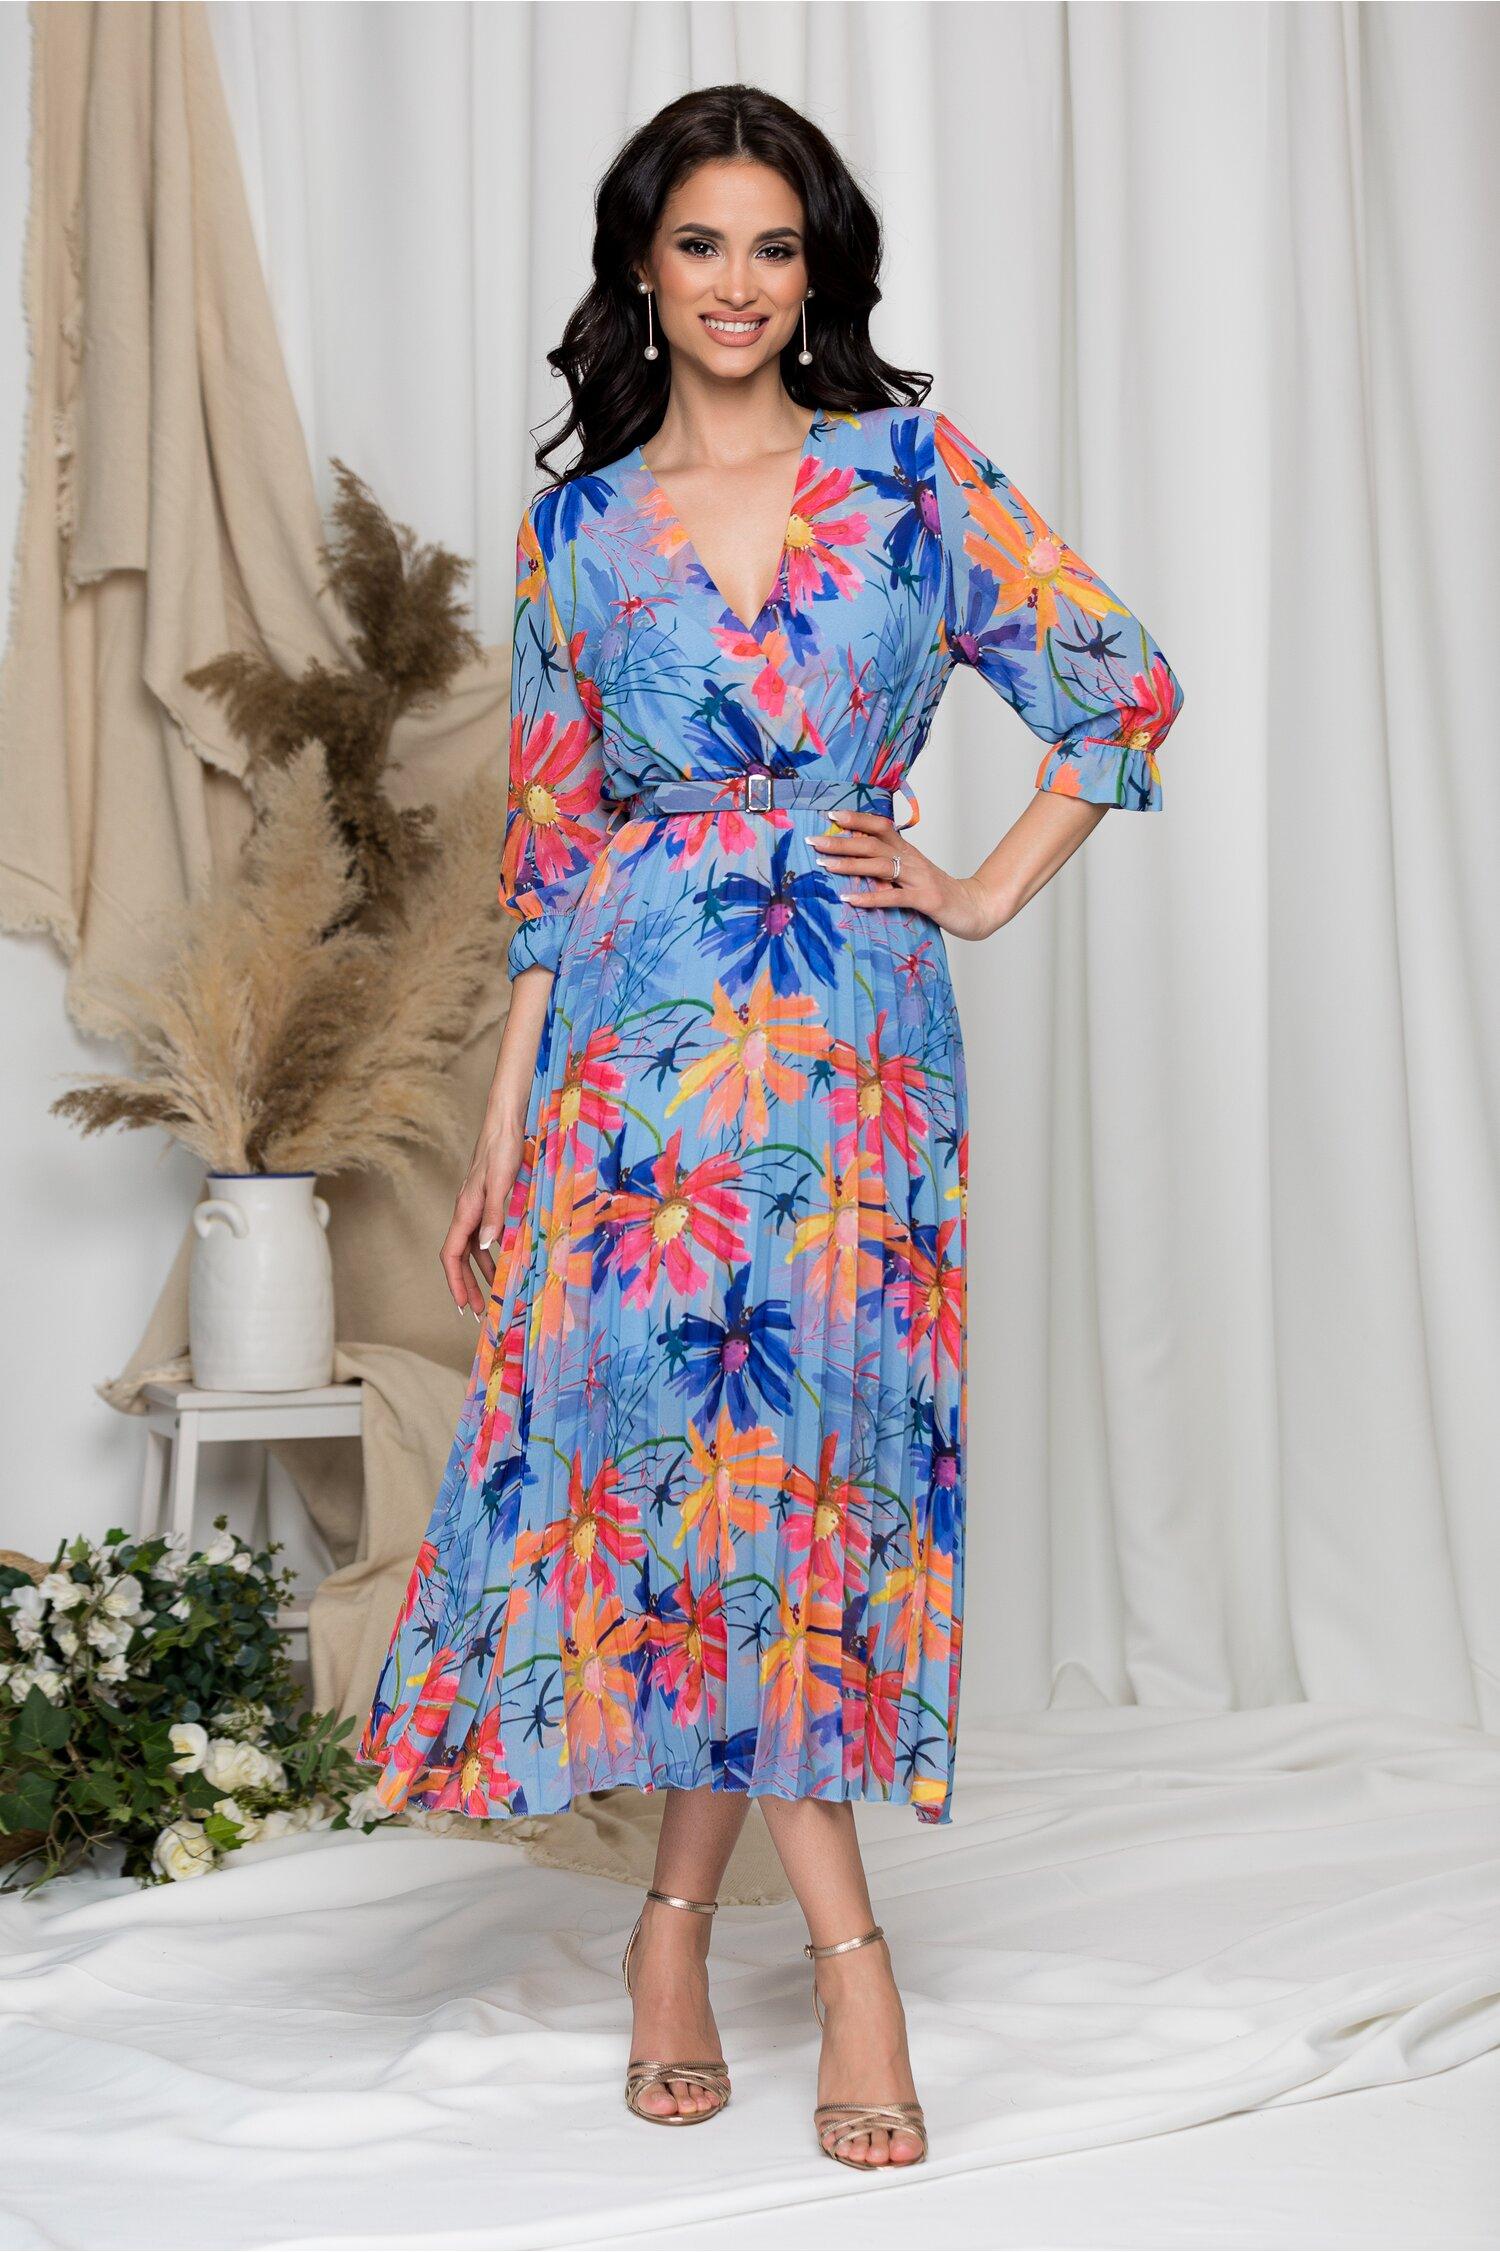 Rochie Beatrice bleu cu imprimeu floral imagine dyfashion.ro 2021